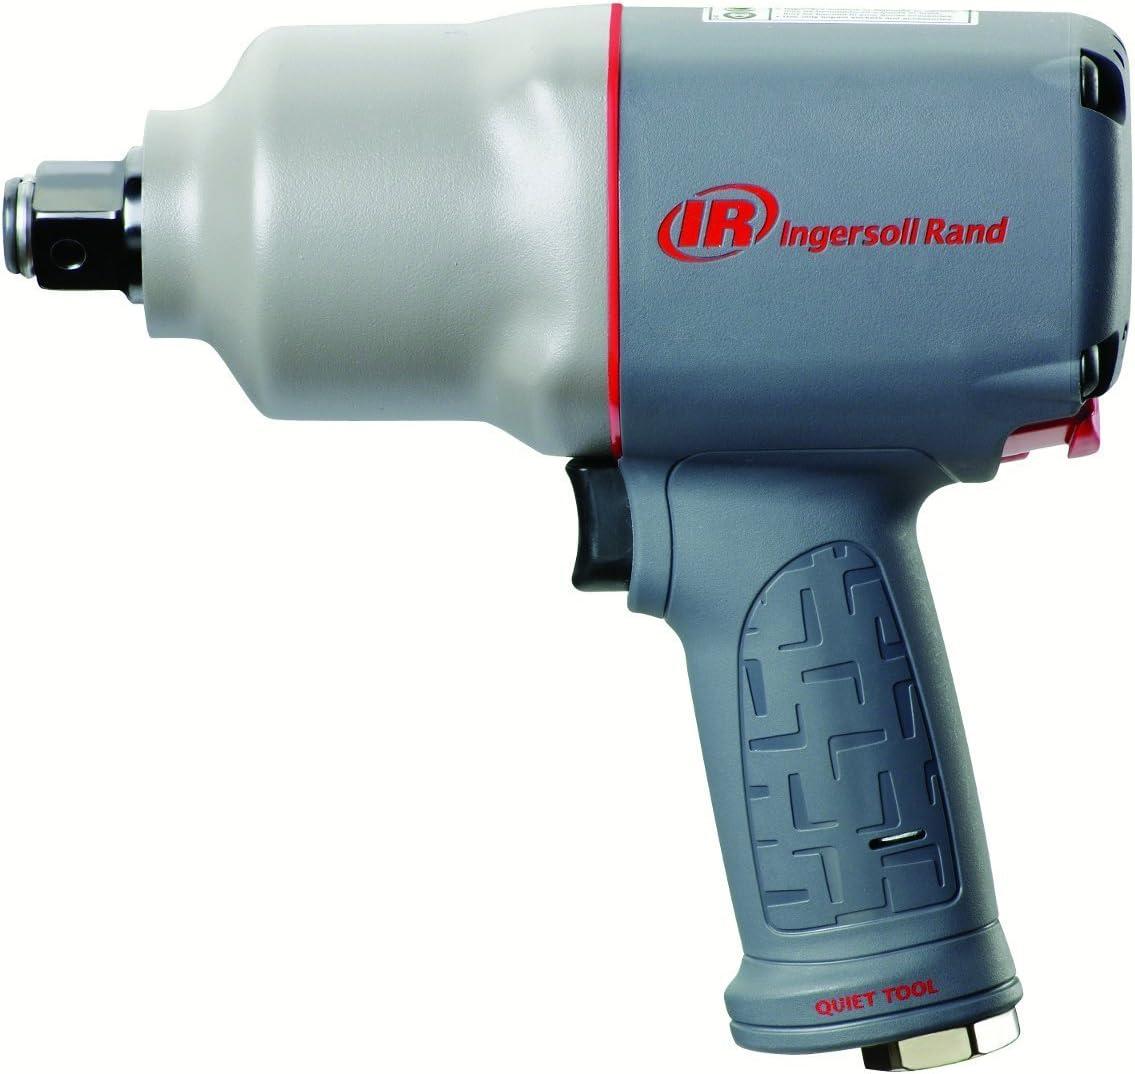 Mac tools air drill manual download